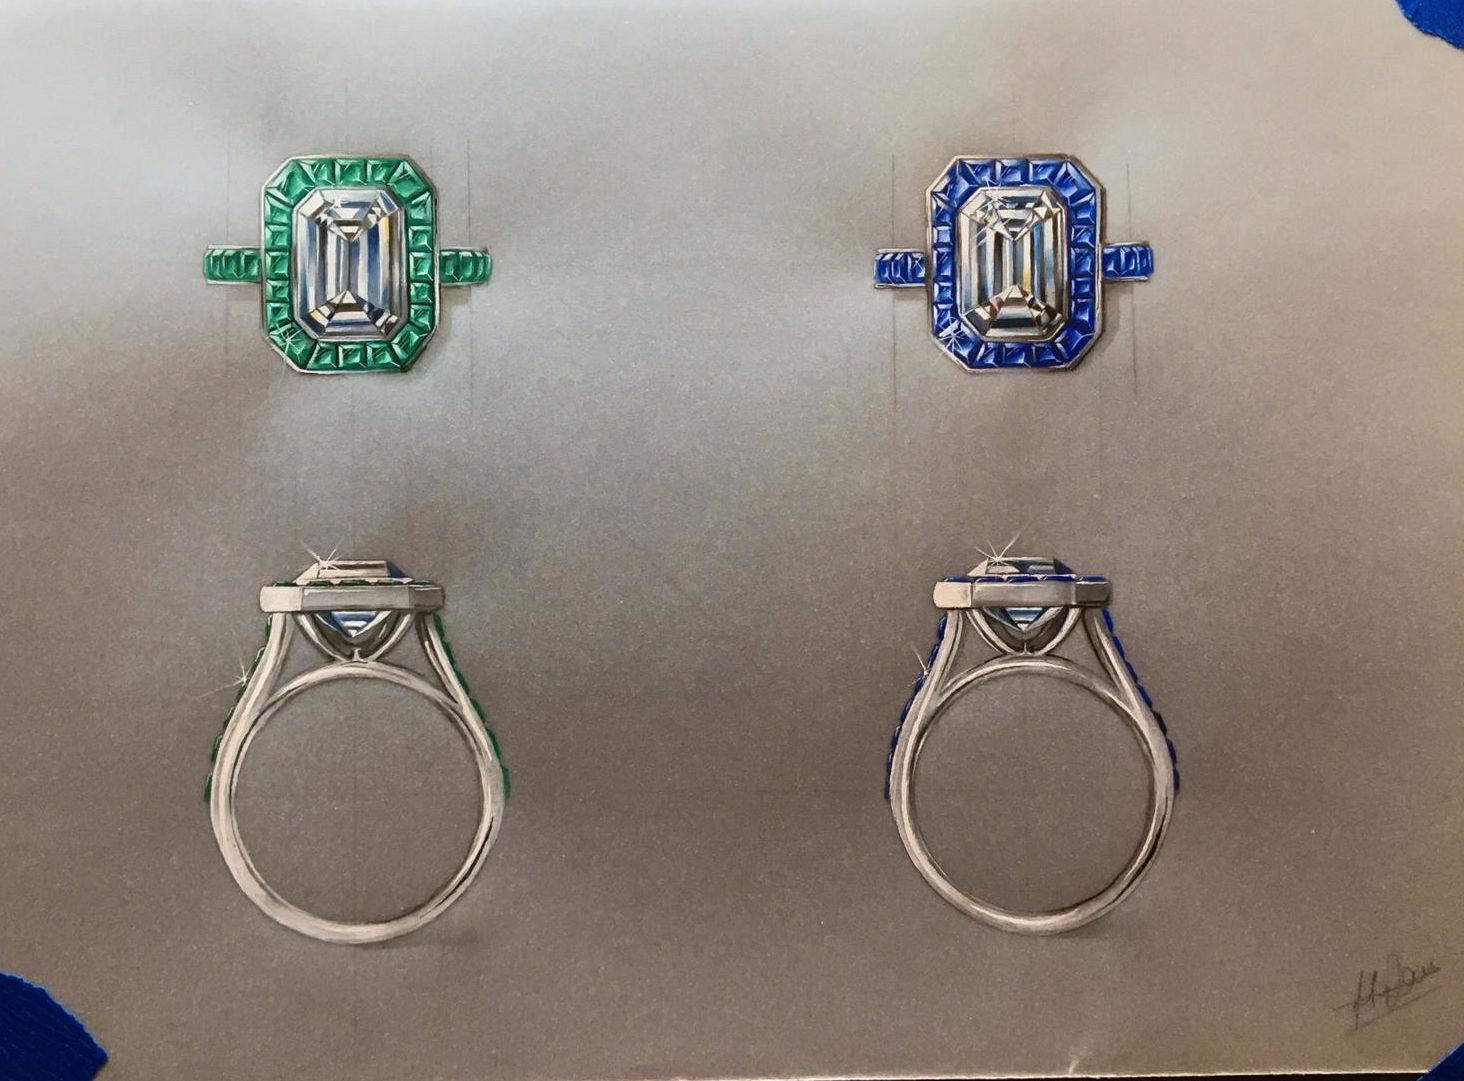 Dorset Rendering Emerald and Sapphire 1